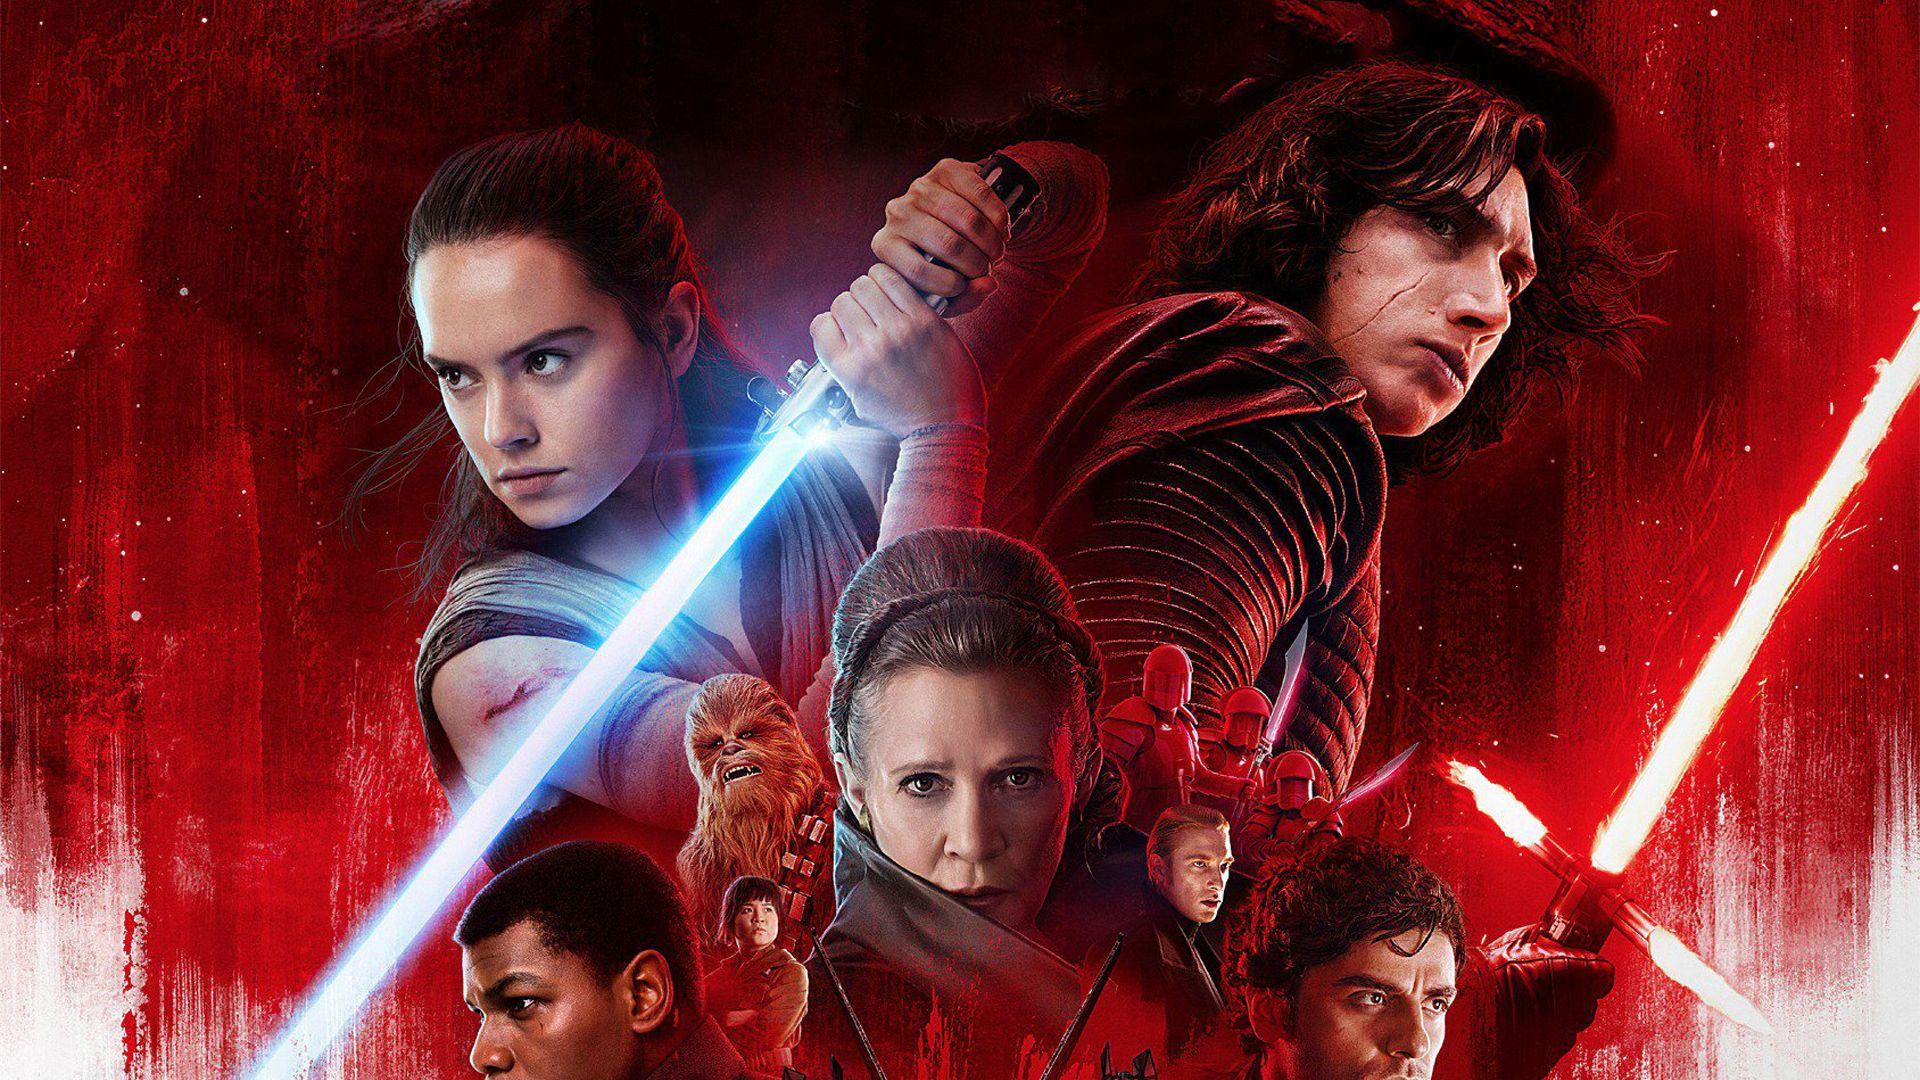 Wallpaper movie, poster, Star Wars: The Last Jedi